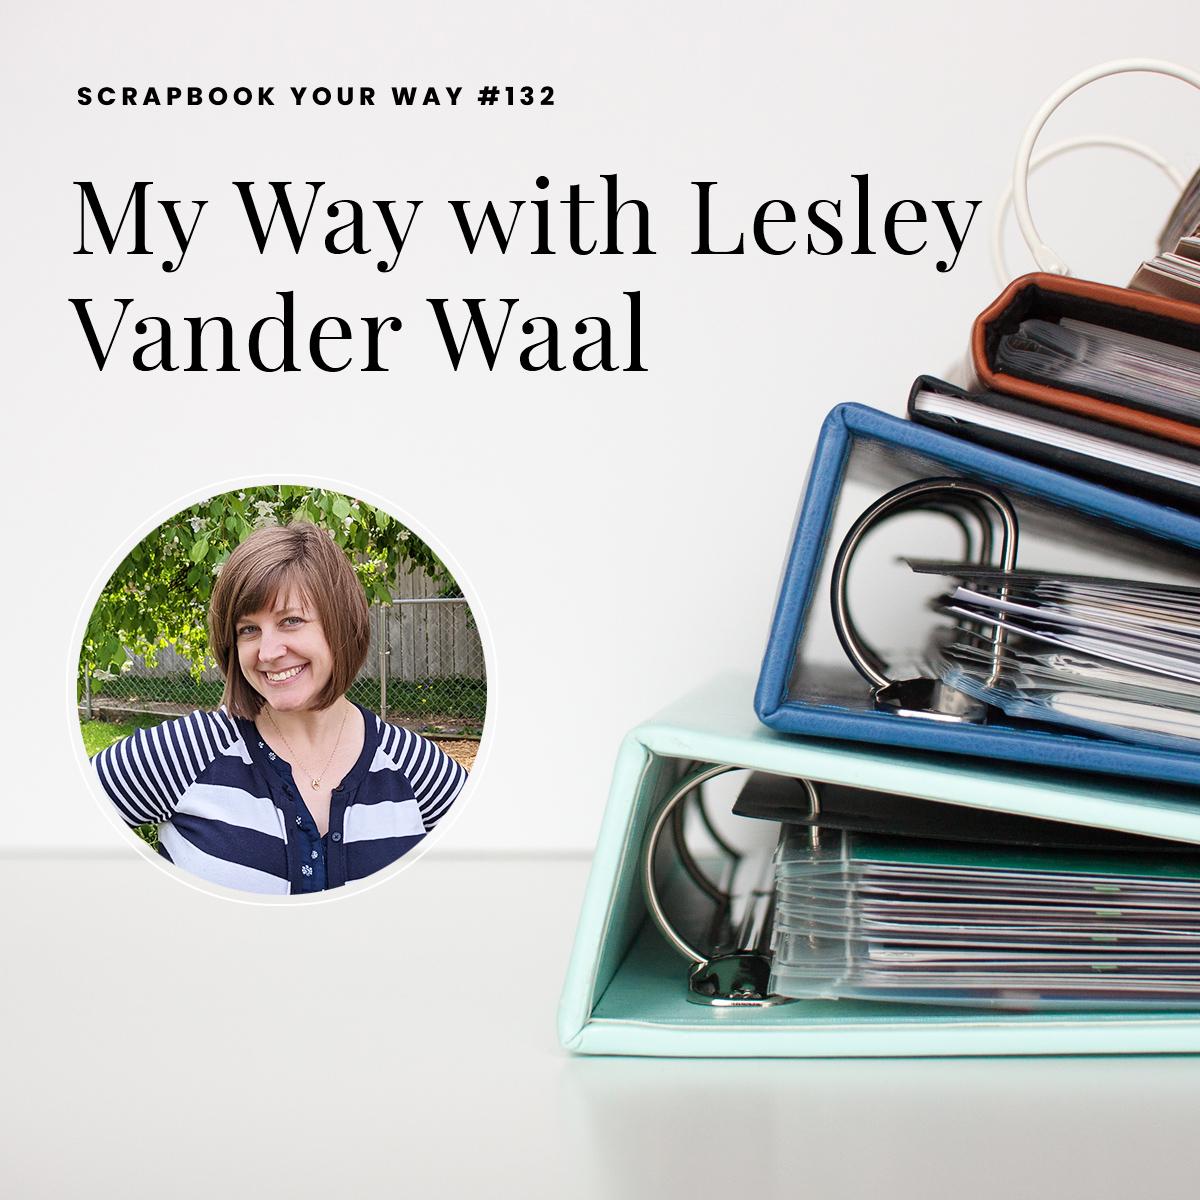 SYW132 - My Way with Lesley Vander Waal